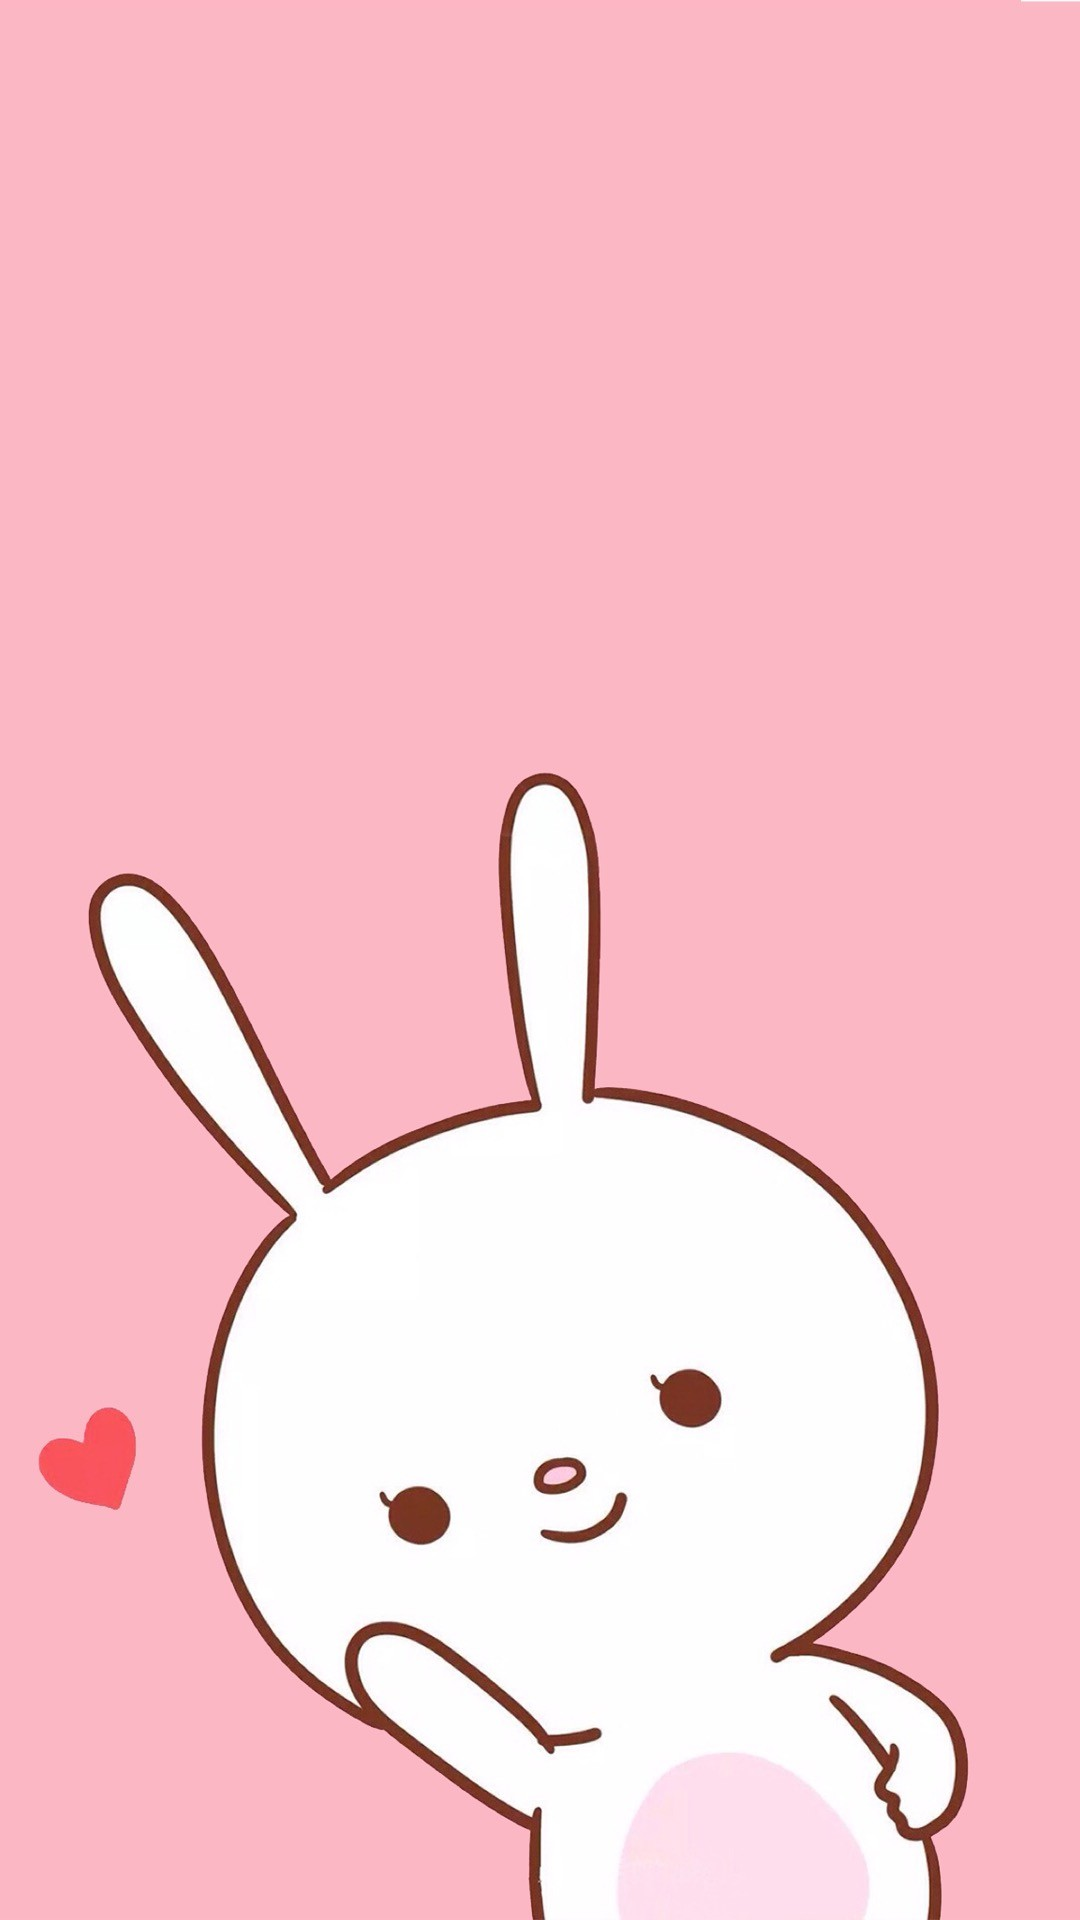 cute wallpapers iphone kawaii bunny cartoon emoji pink fondos rabbit pantalla hupages backgrounds emojis pastel phone marshmallow wallpaperaccess novios animals